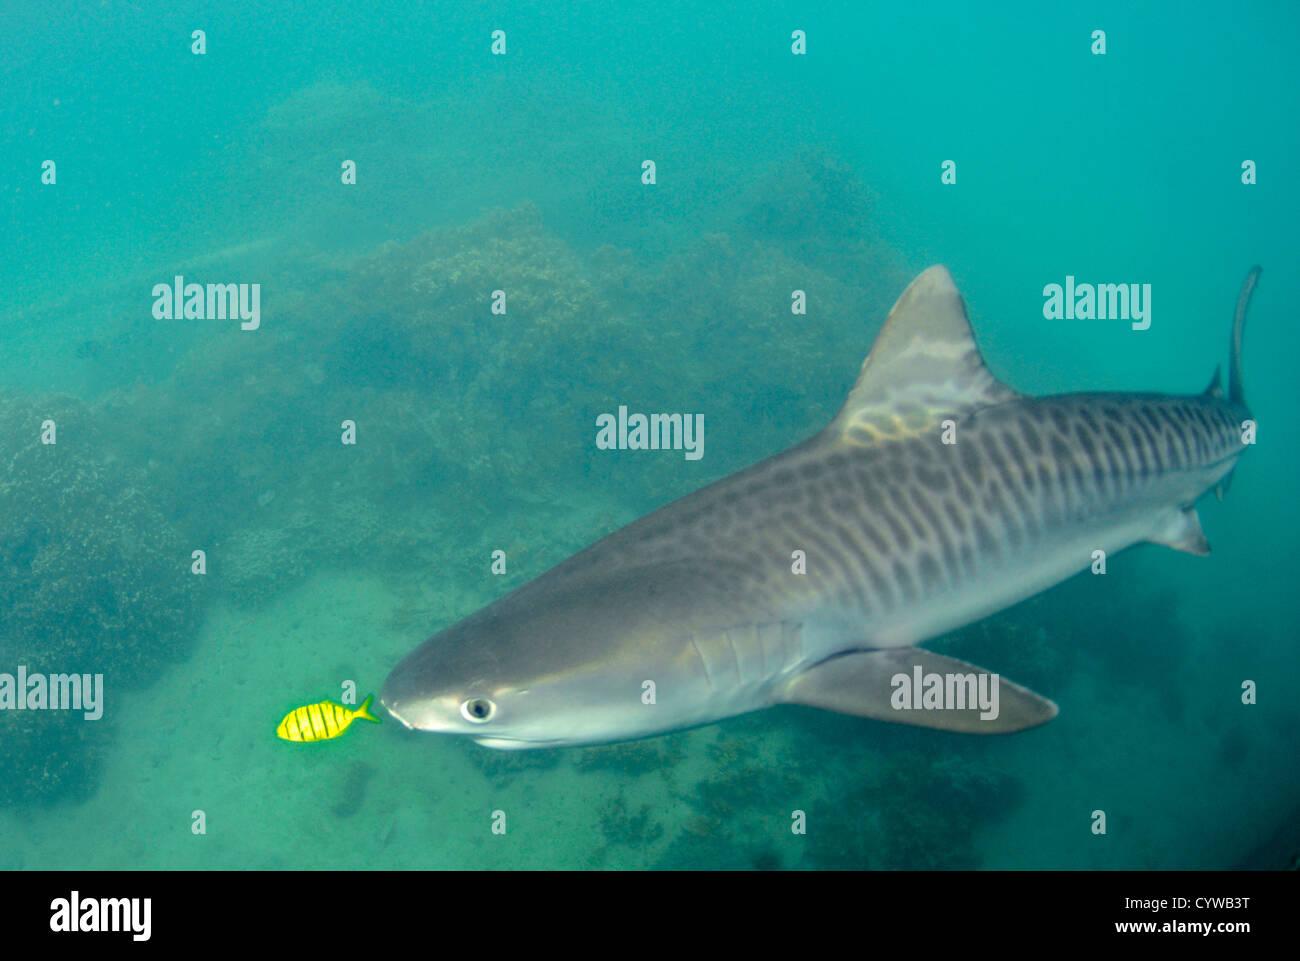 Young tiger shark, Galeocerdo cuvier, accompanied by golden trevally, Gnathanodon speciosus, Kaneohe, Hawaii, USA - Stock Image